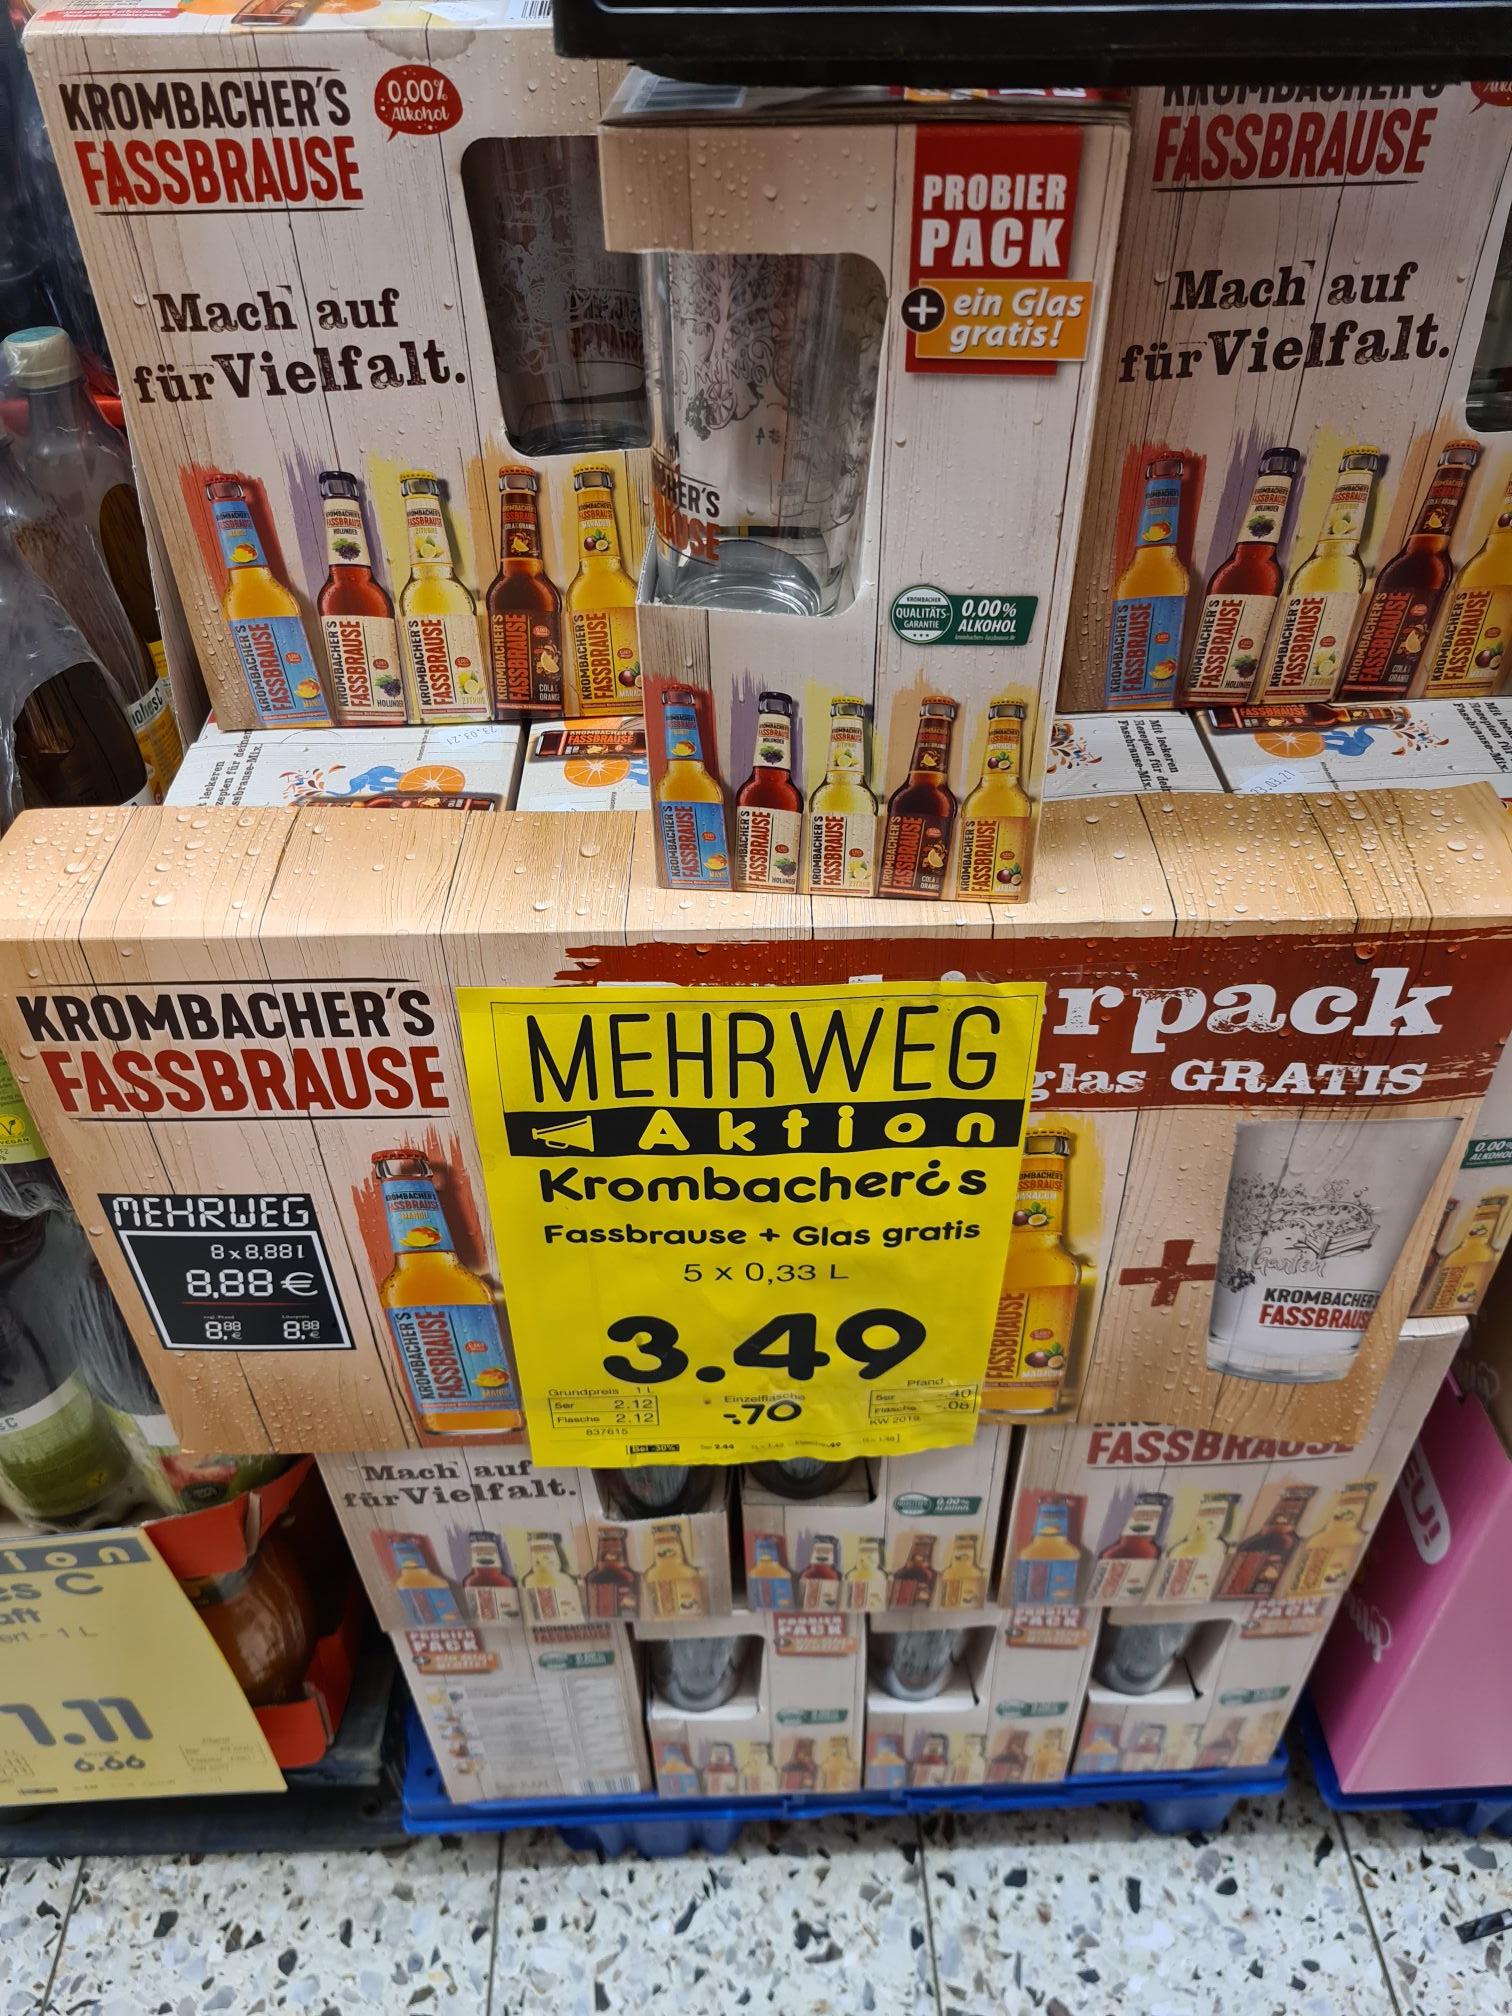 Krombacher Fassbrause 5x 0.33ml + Glas Gratis bei Netto